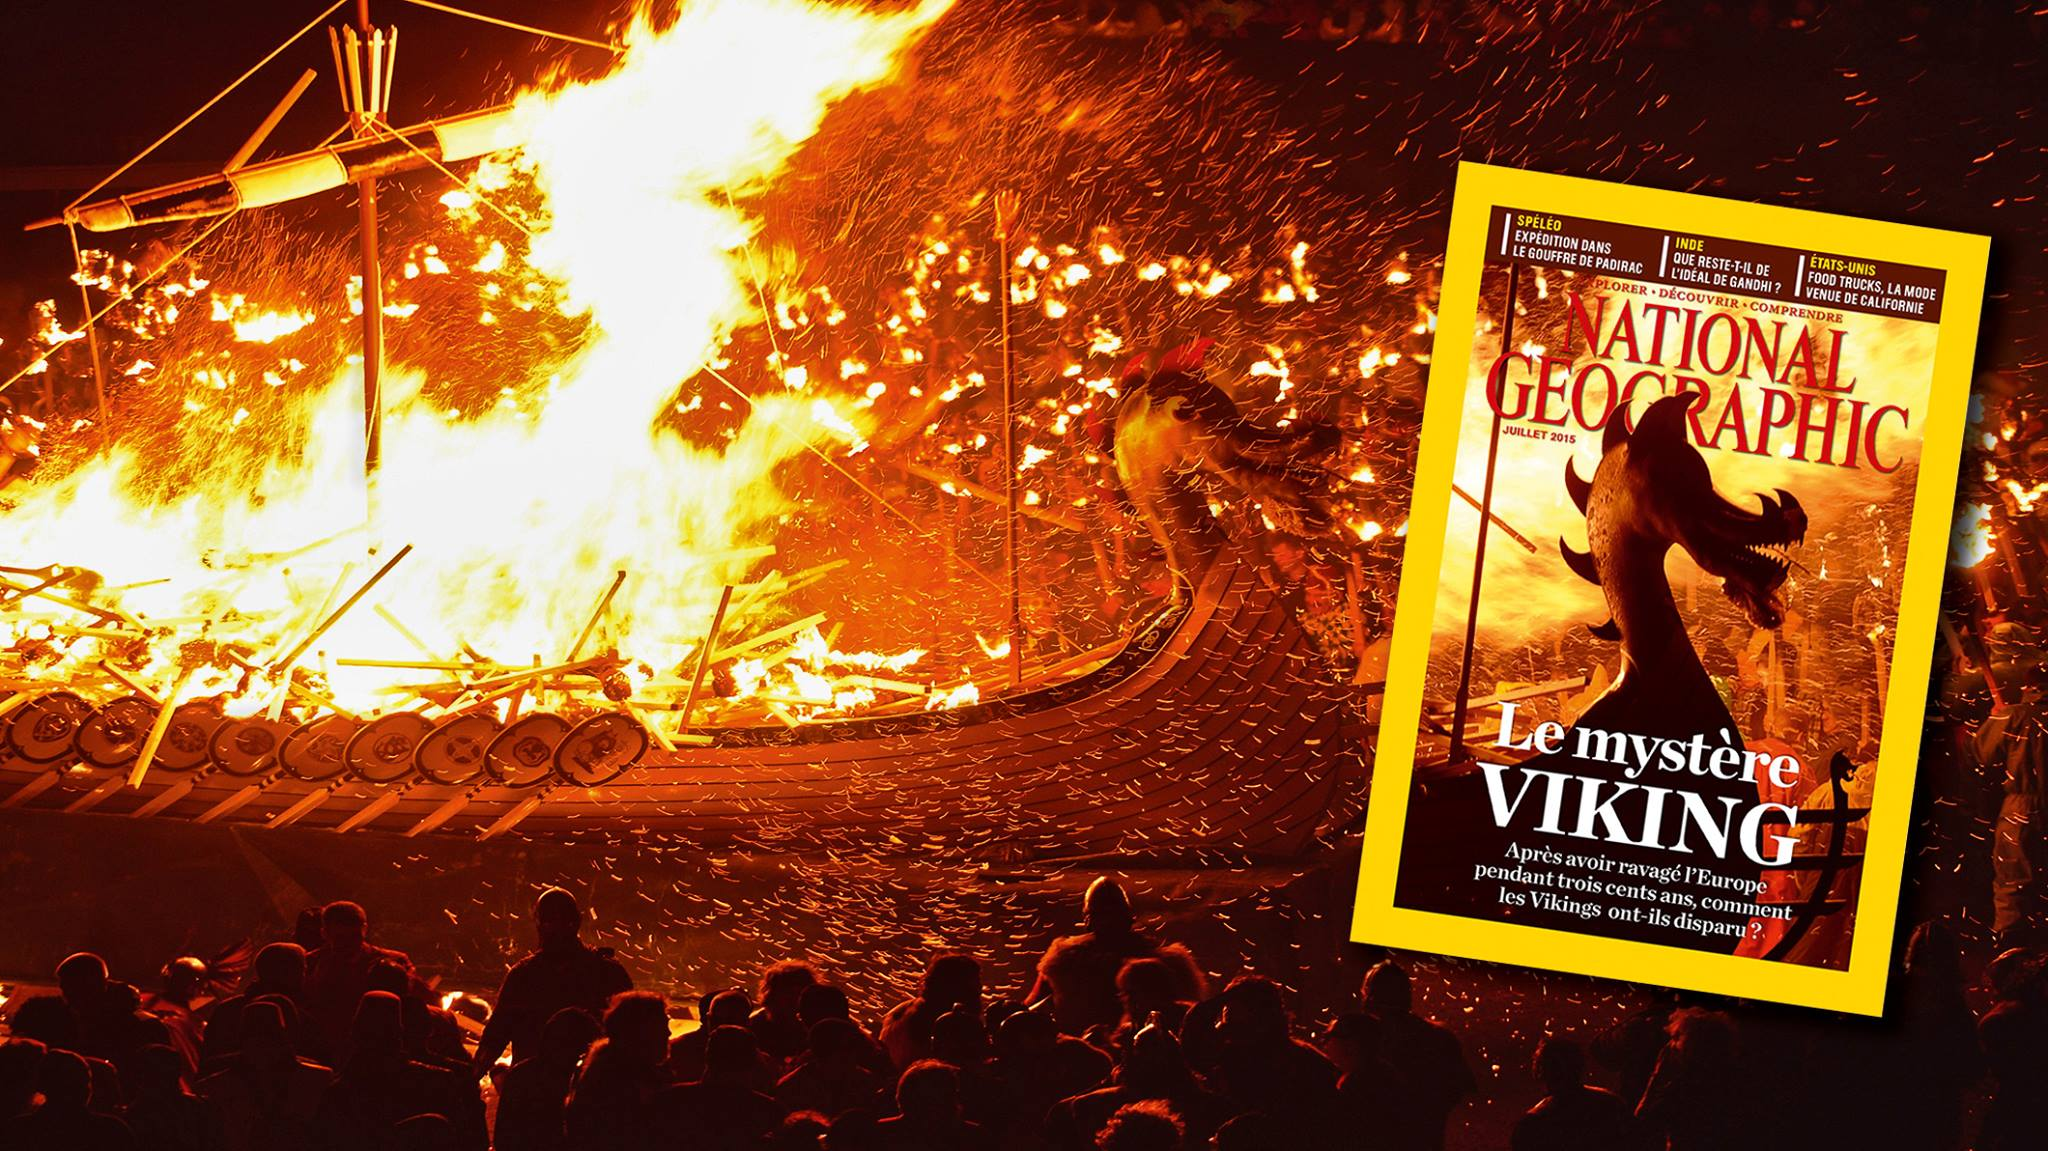 le mystère viking